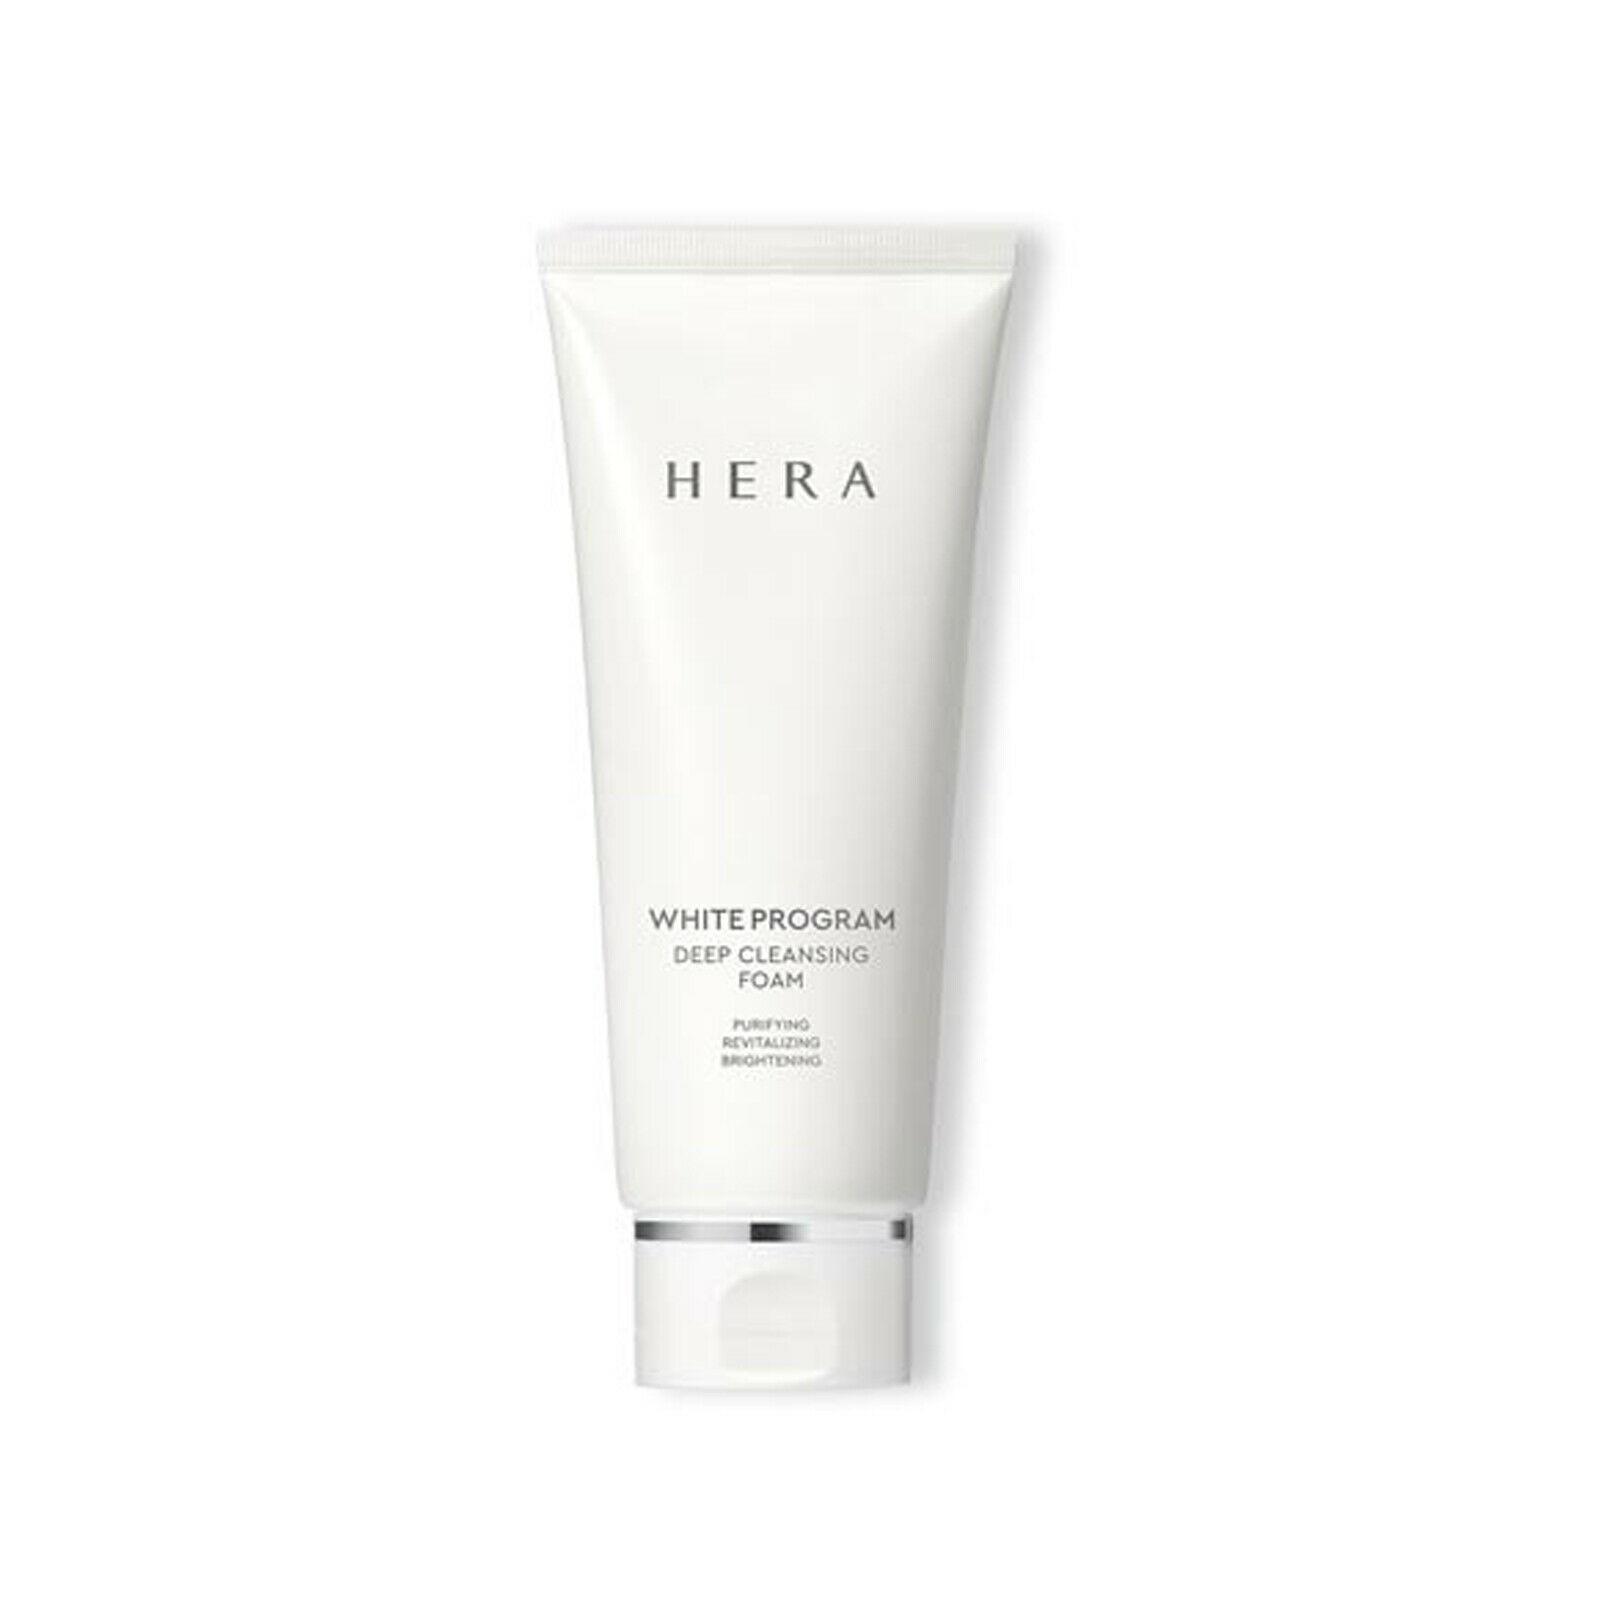 HERA - White Program Deep Cleansing Foam